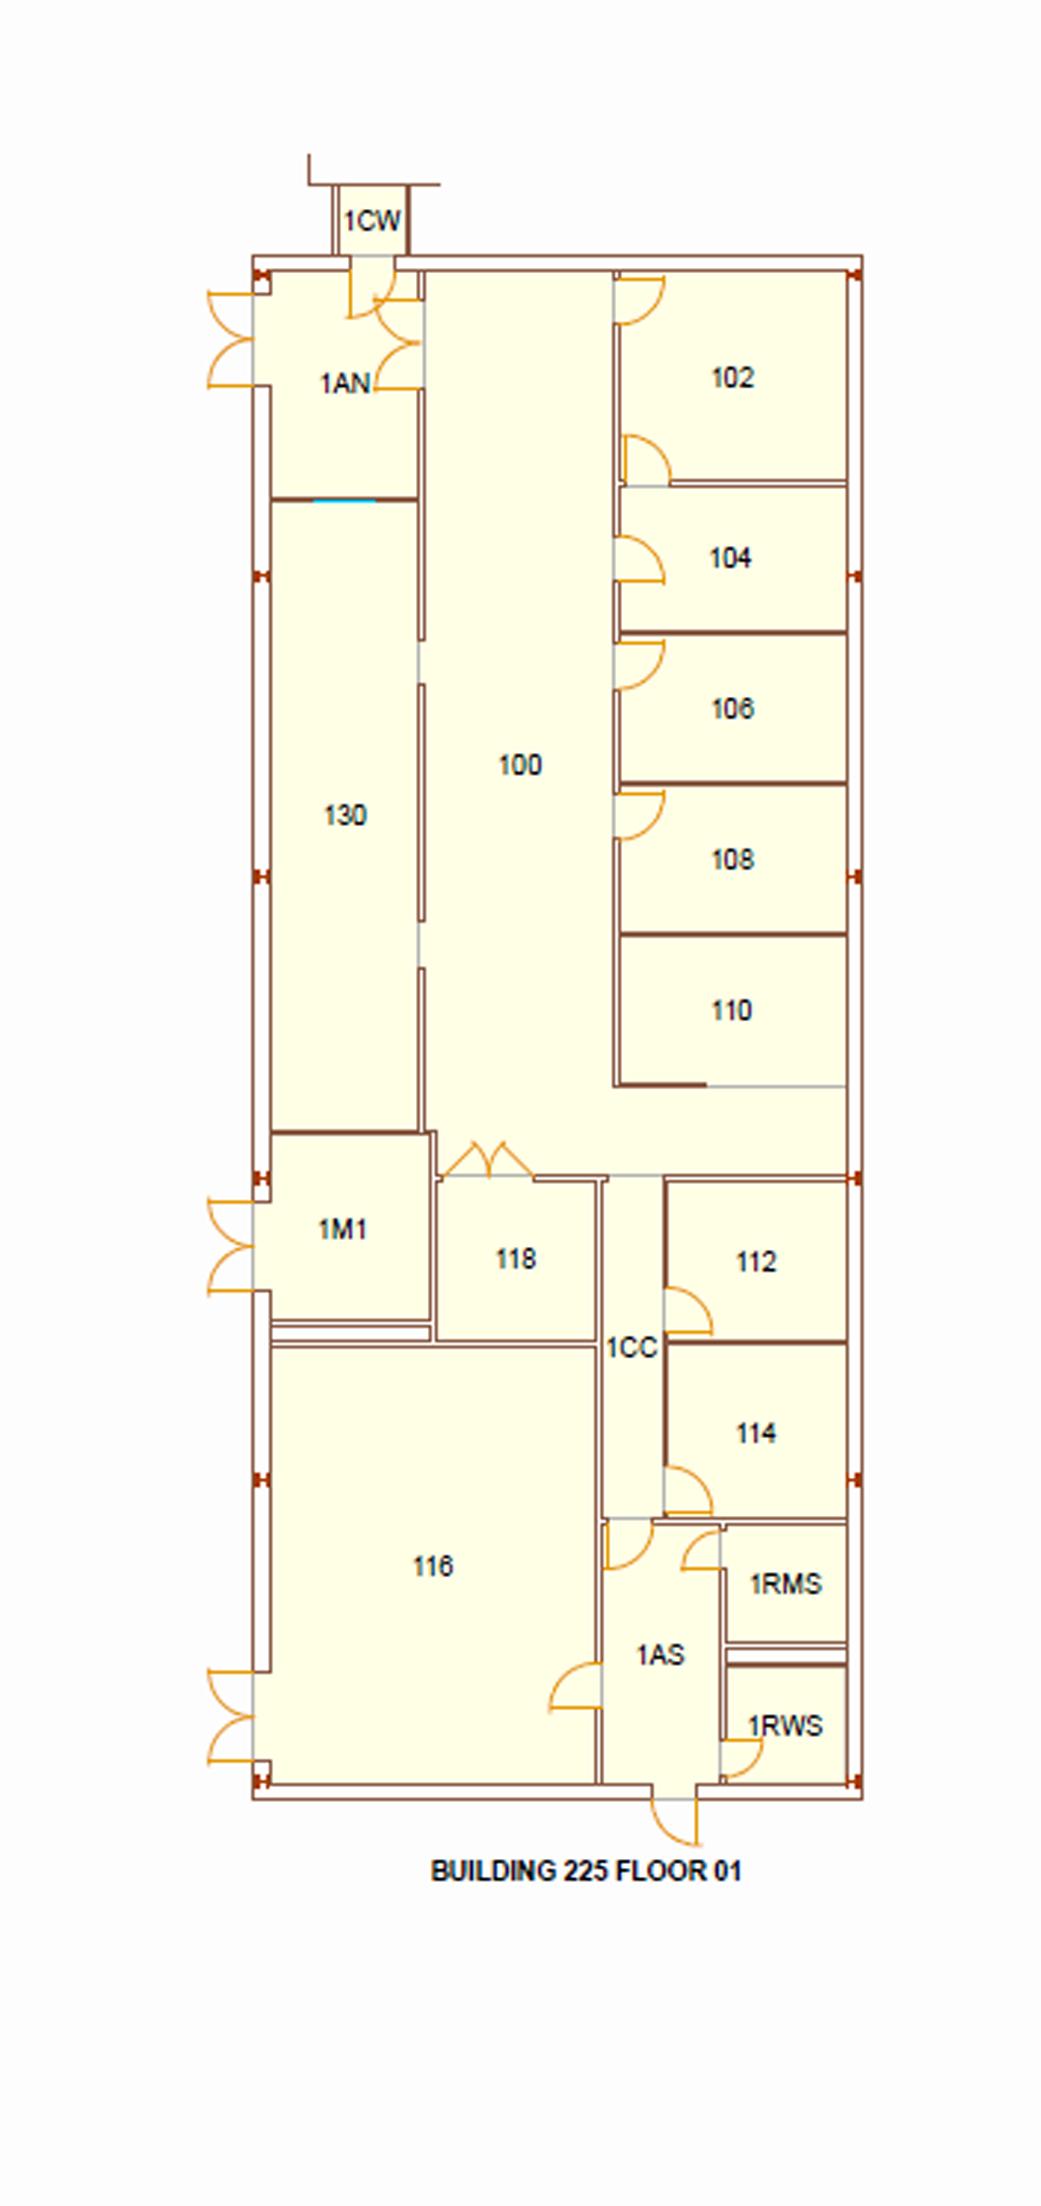 Building Diagram